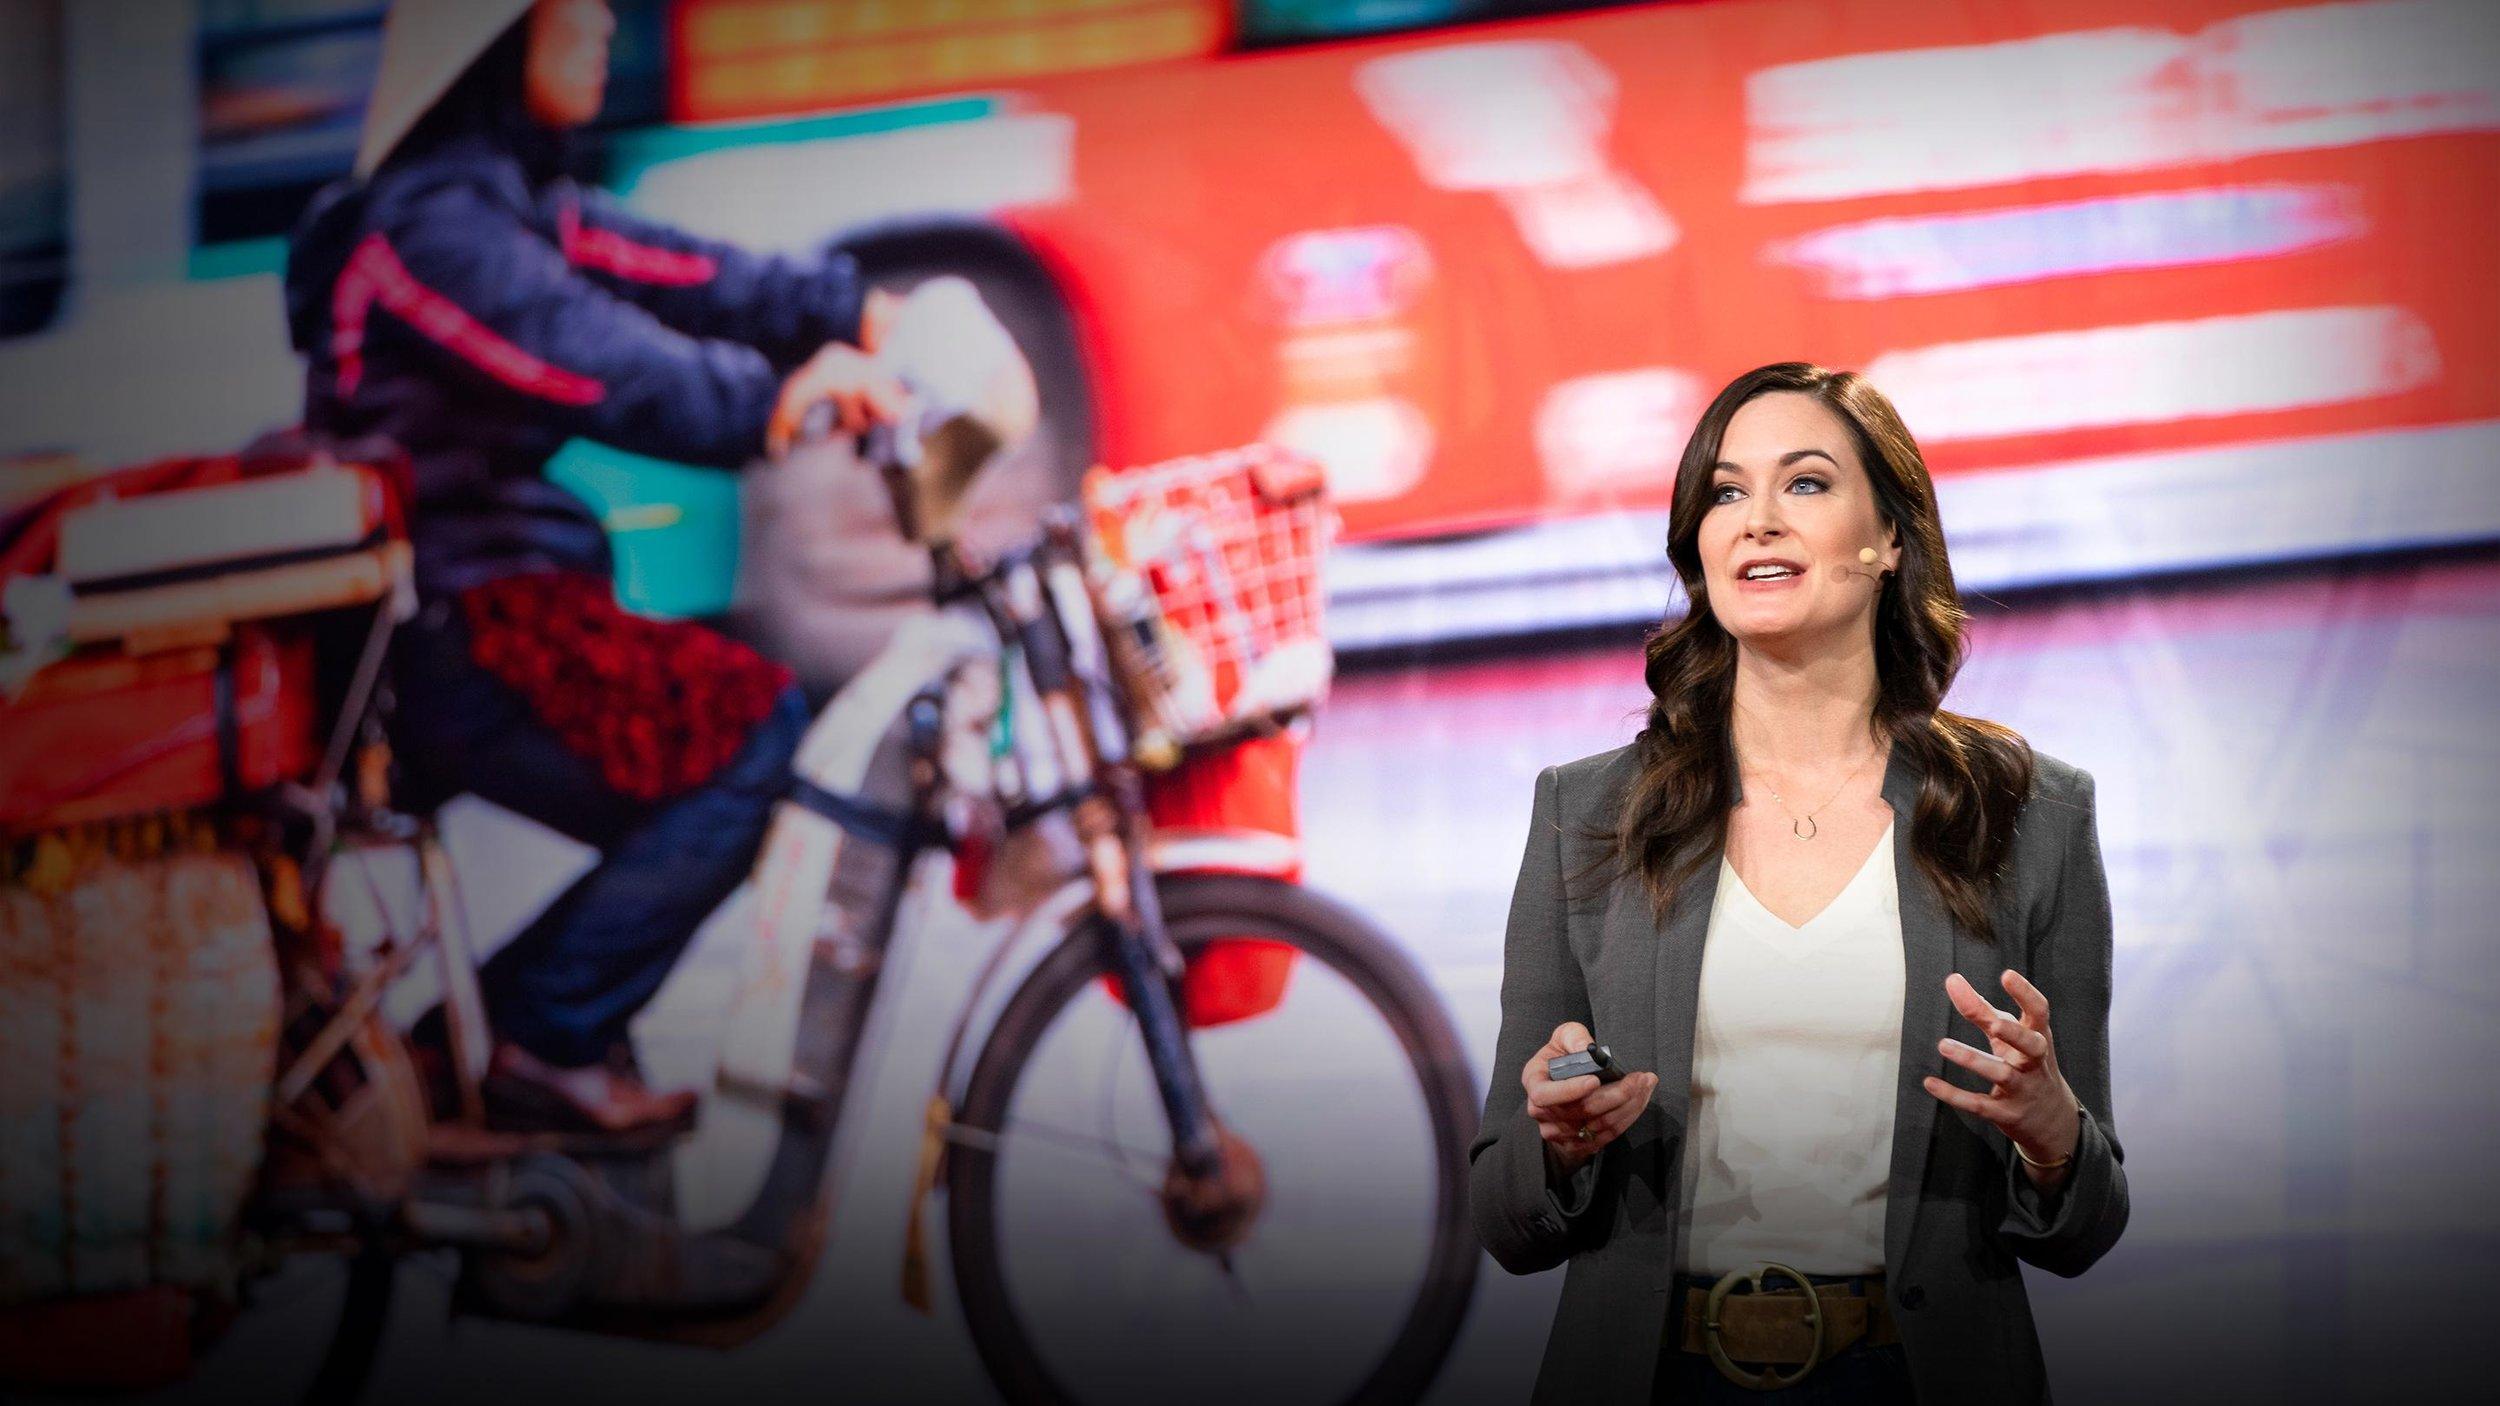 Photo credit: TED Talks